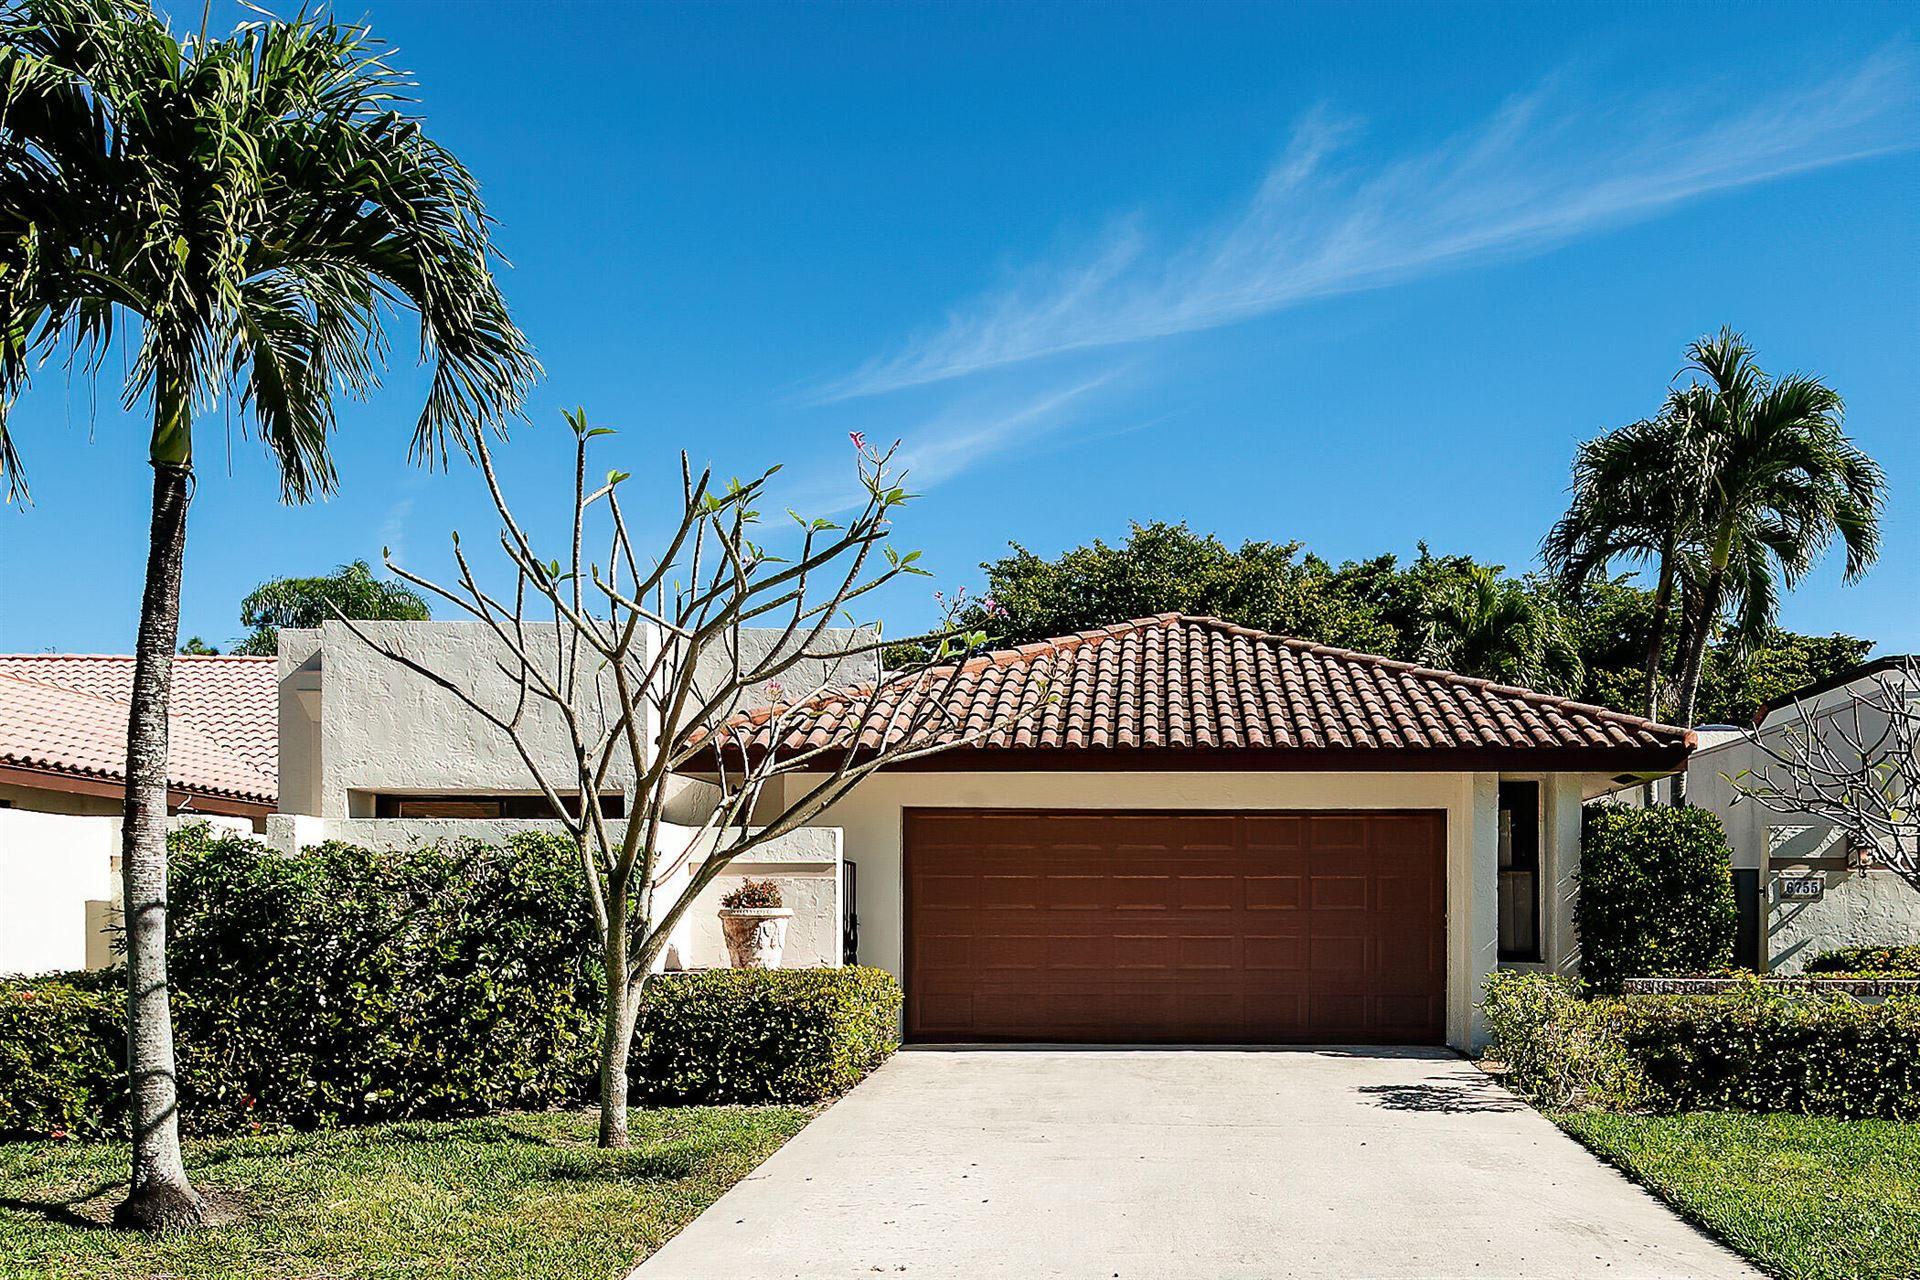 6755 Lago Vista Terrace, Boca Raton, FL 33433 - #: RX-10709019